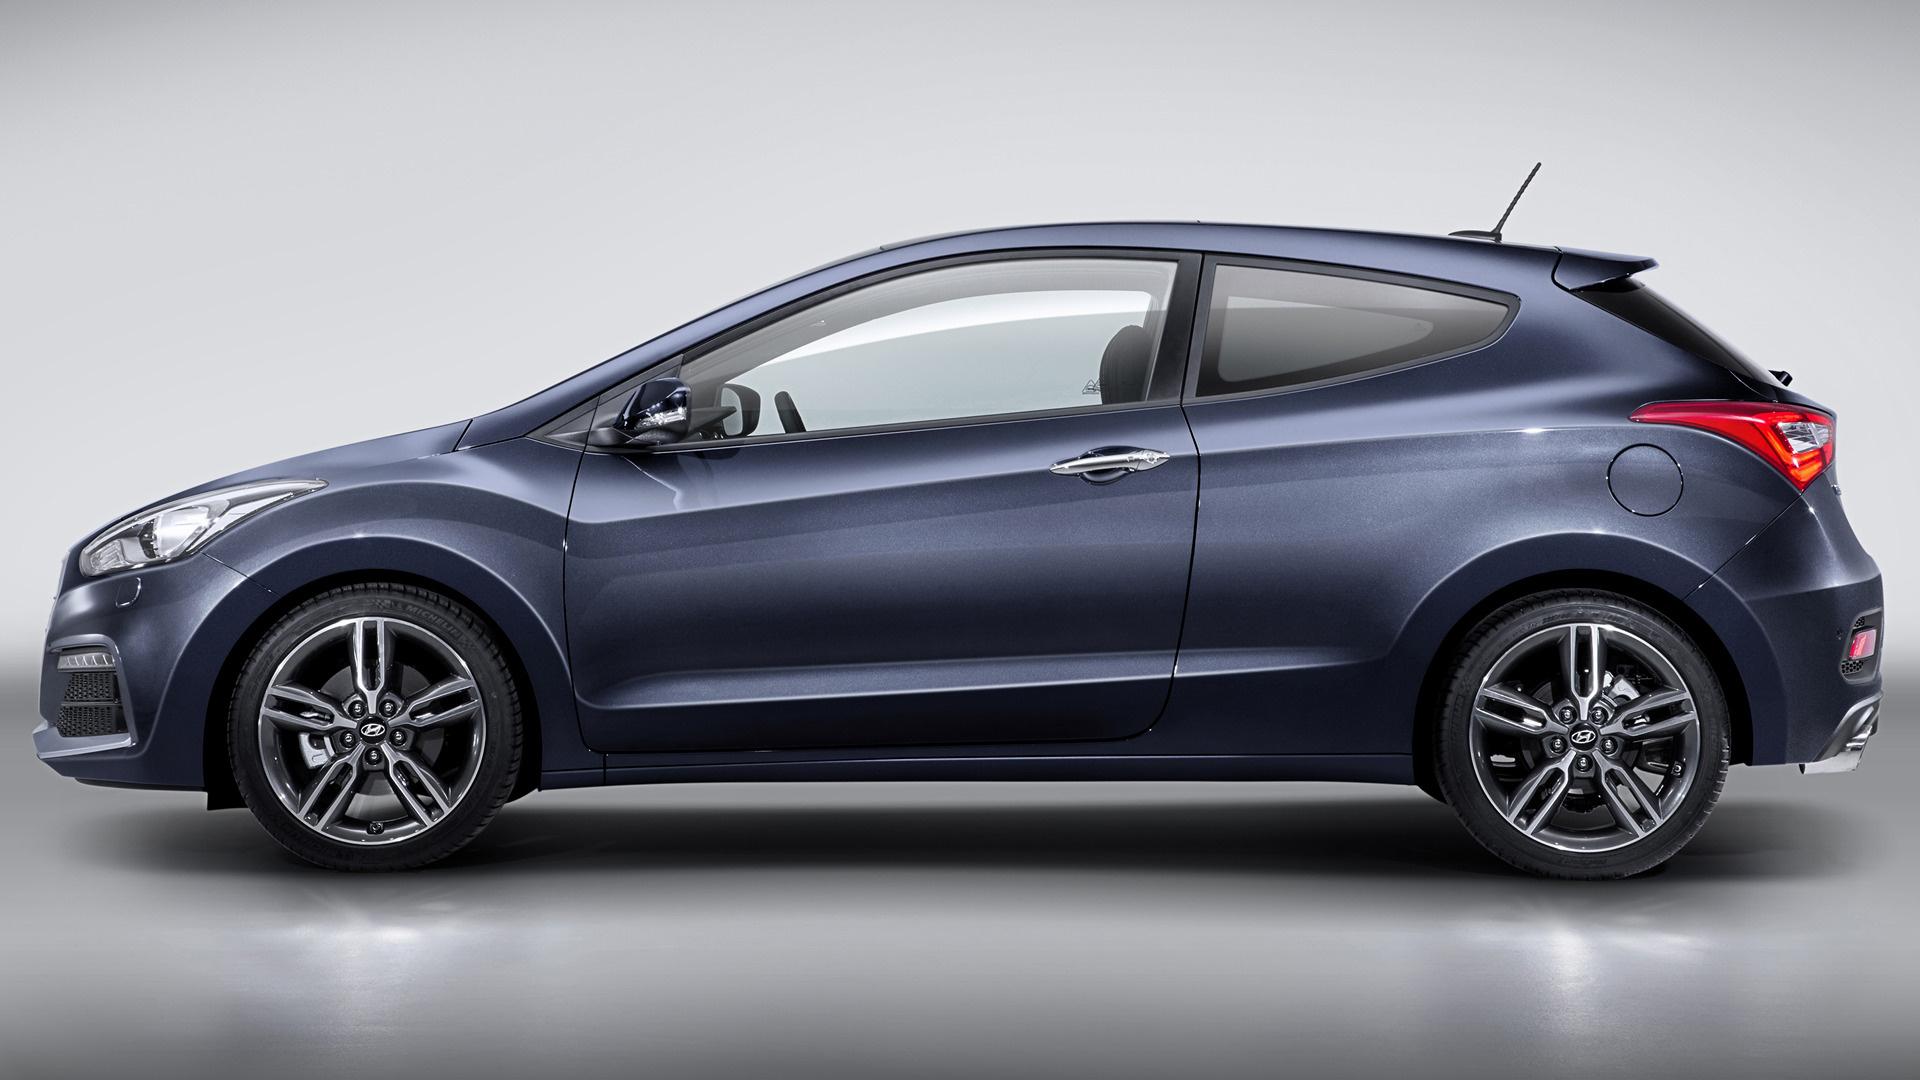 Hyundai i30 3 door turbo 2015 wallpapers and hd images car pixel